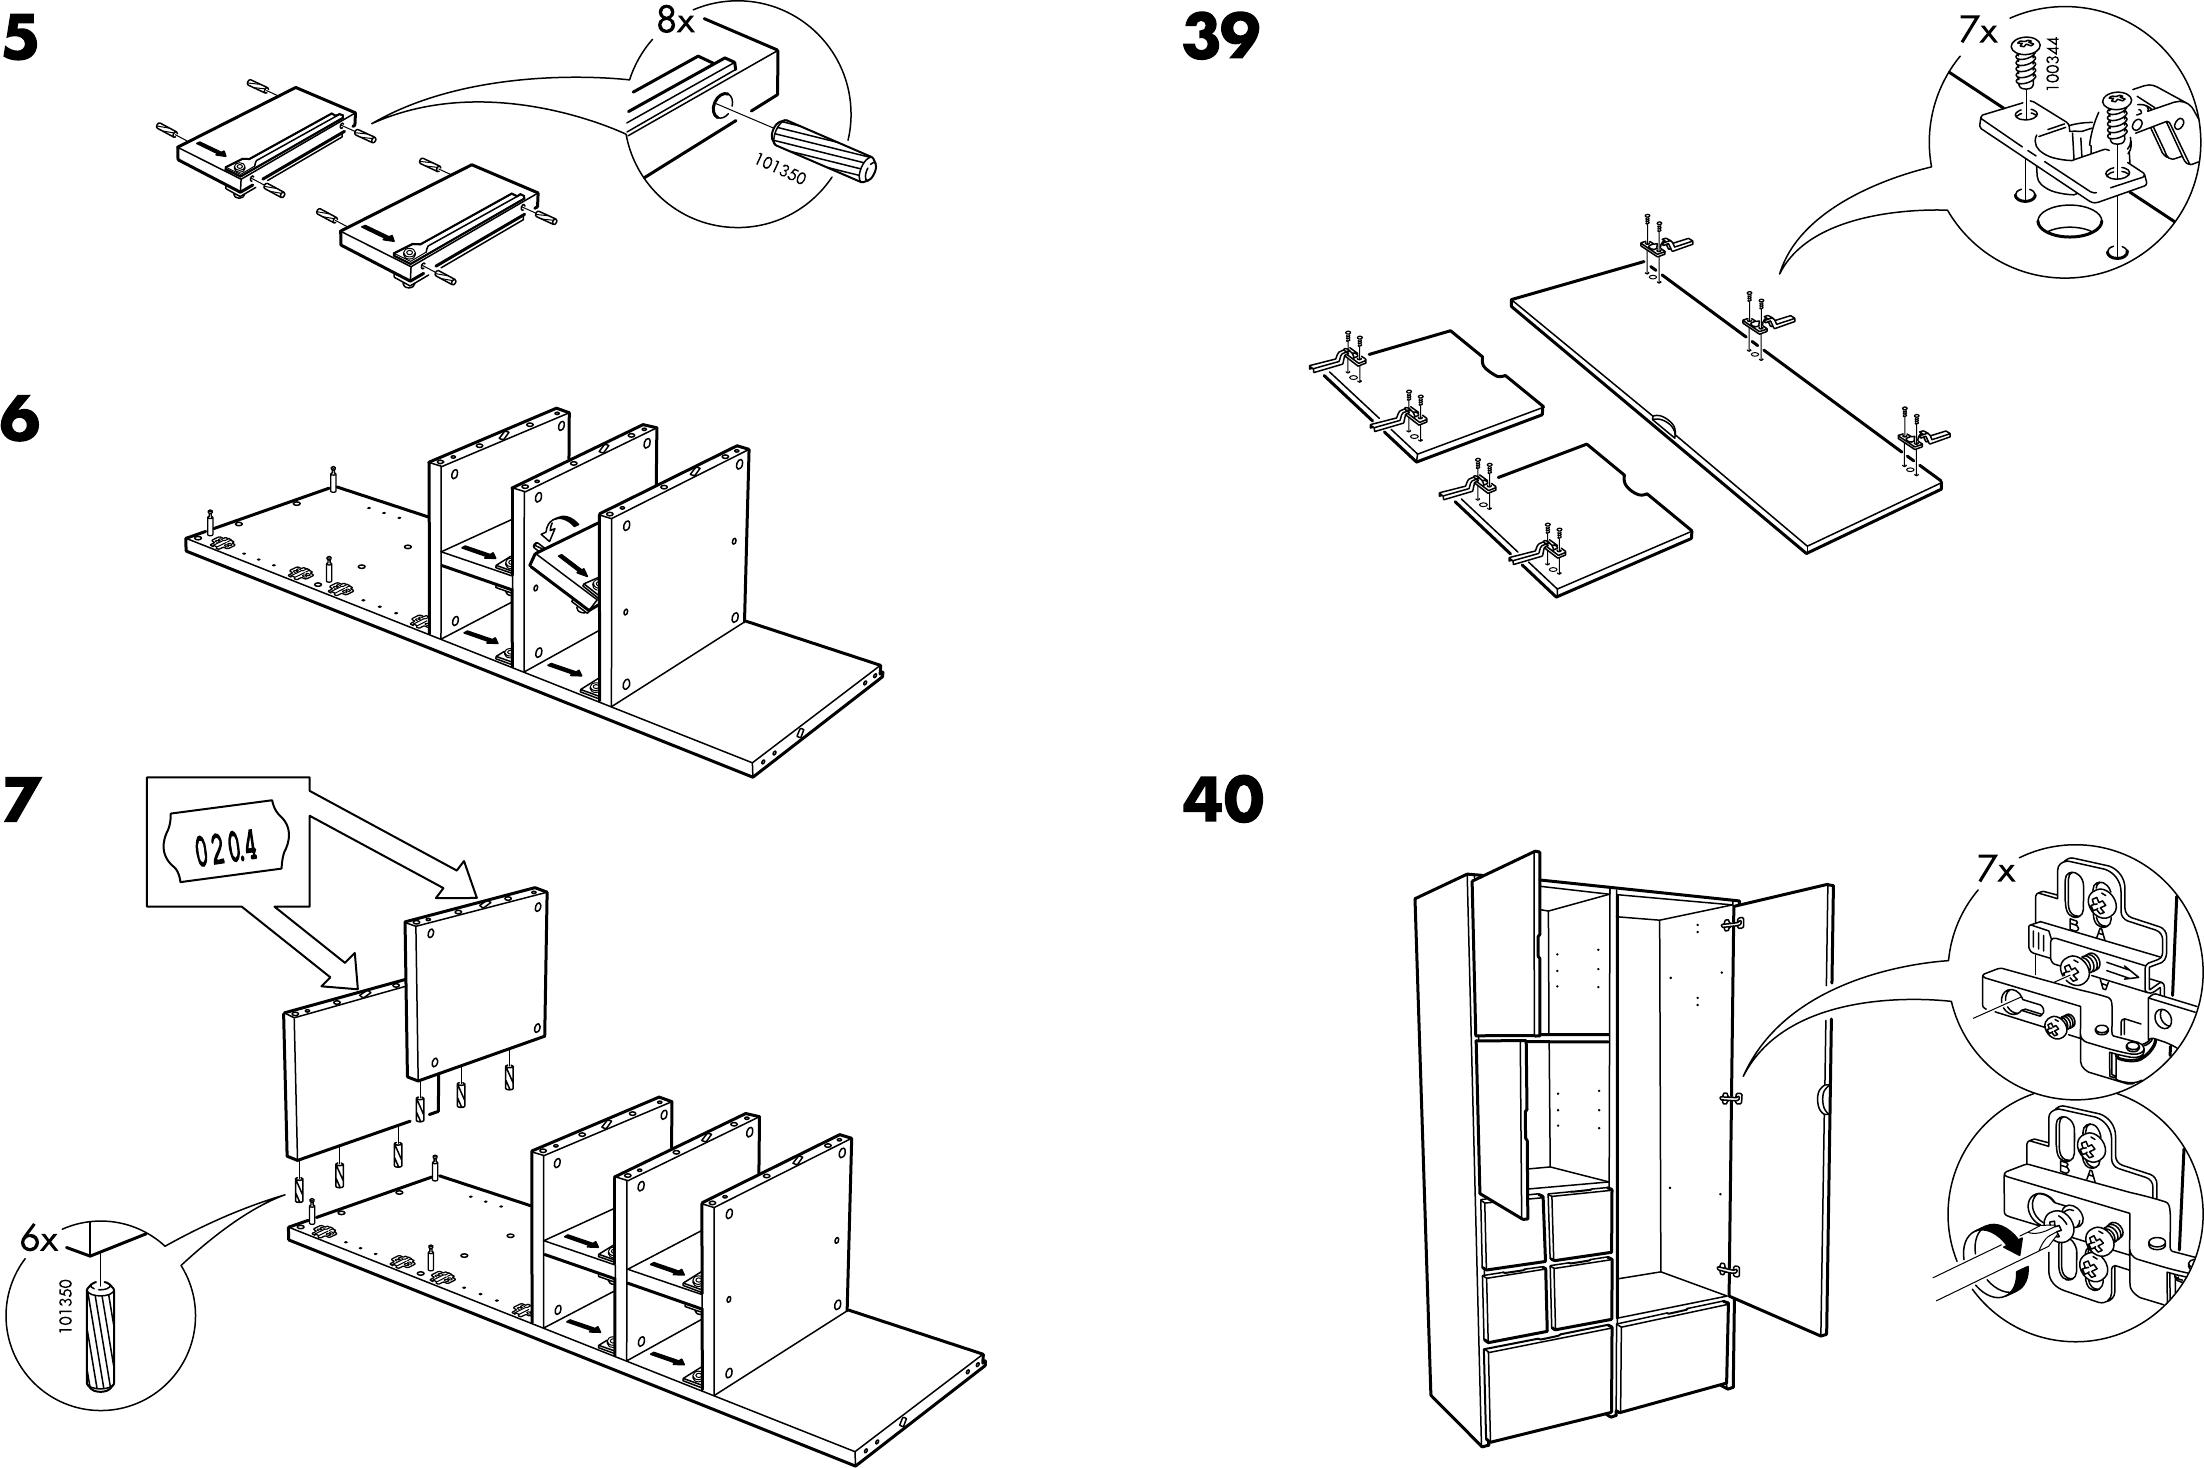 Aspelund Ikea Kast Handleiding ~ Handleiding Ikea Rakke kast (pagina 6 van 12) (Dansk, Deutsch, English